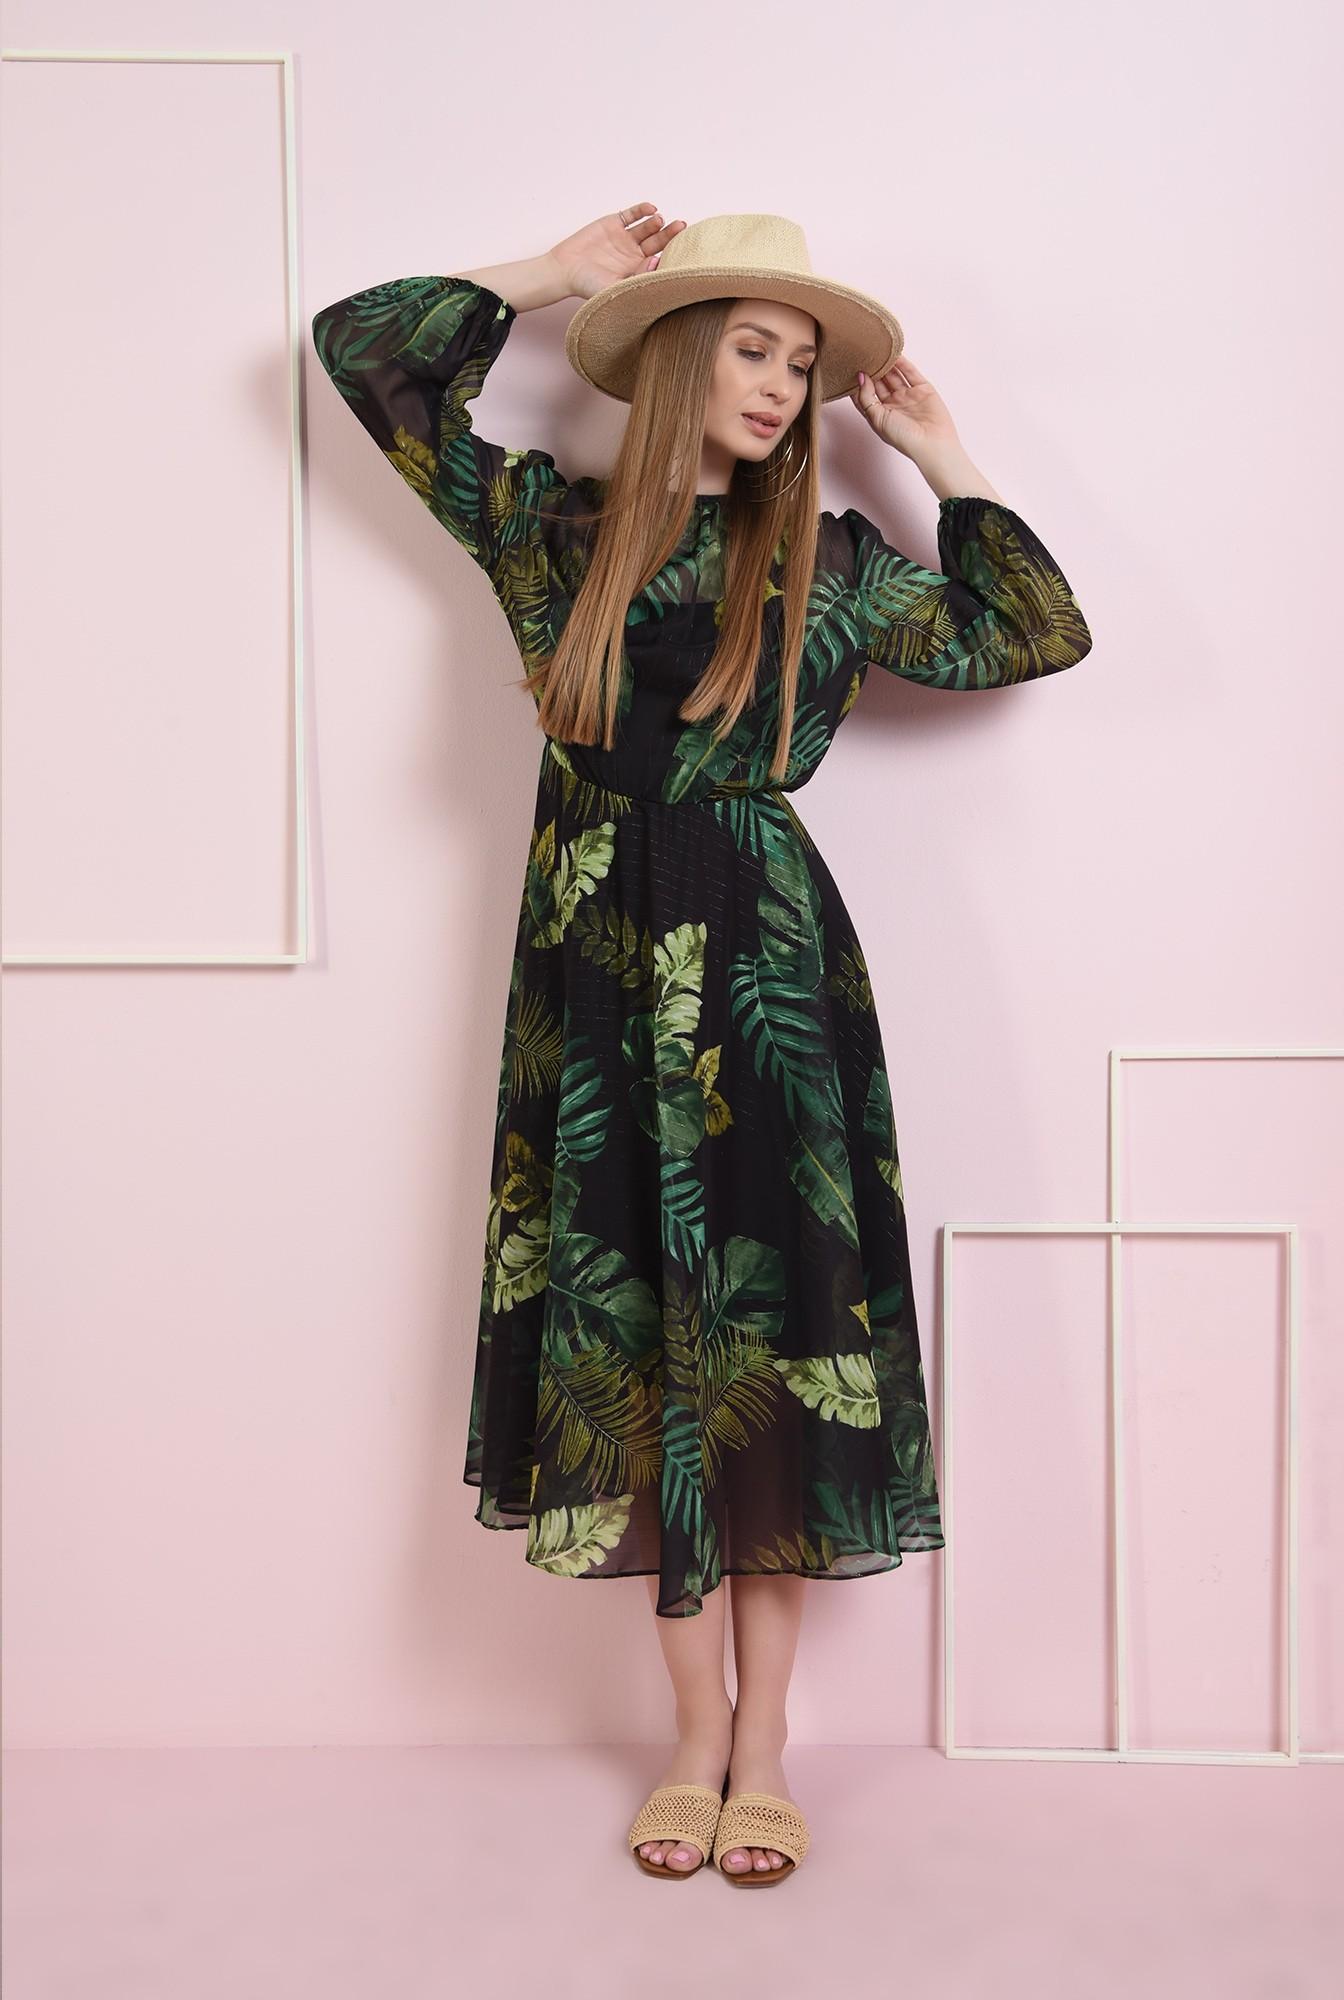 0 - rochie cu imprimeu botanic, evazata